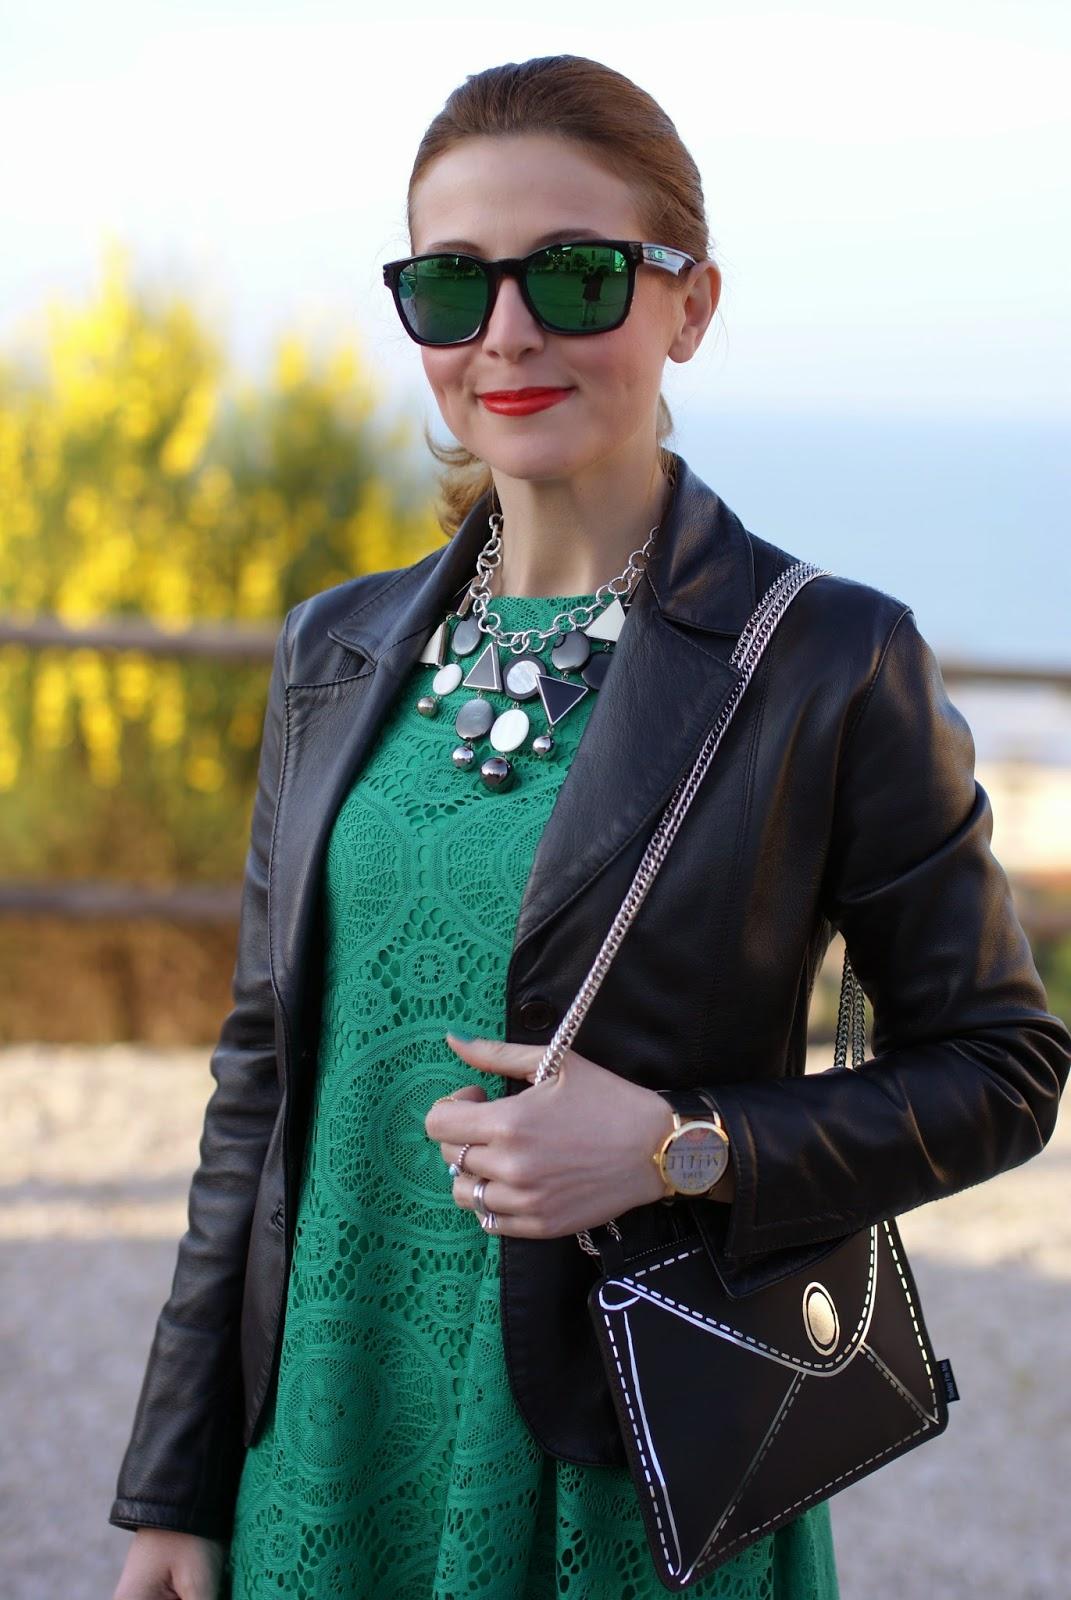 Vitti Ferria Contin collana, Millelire watch, Sheinside green dress, Fashion and Cookies, fashion blogger